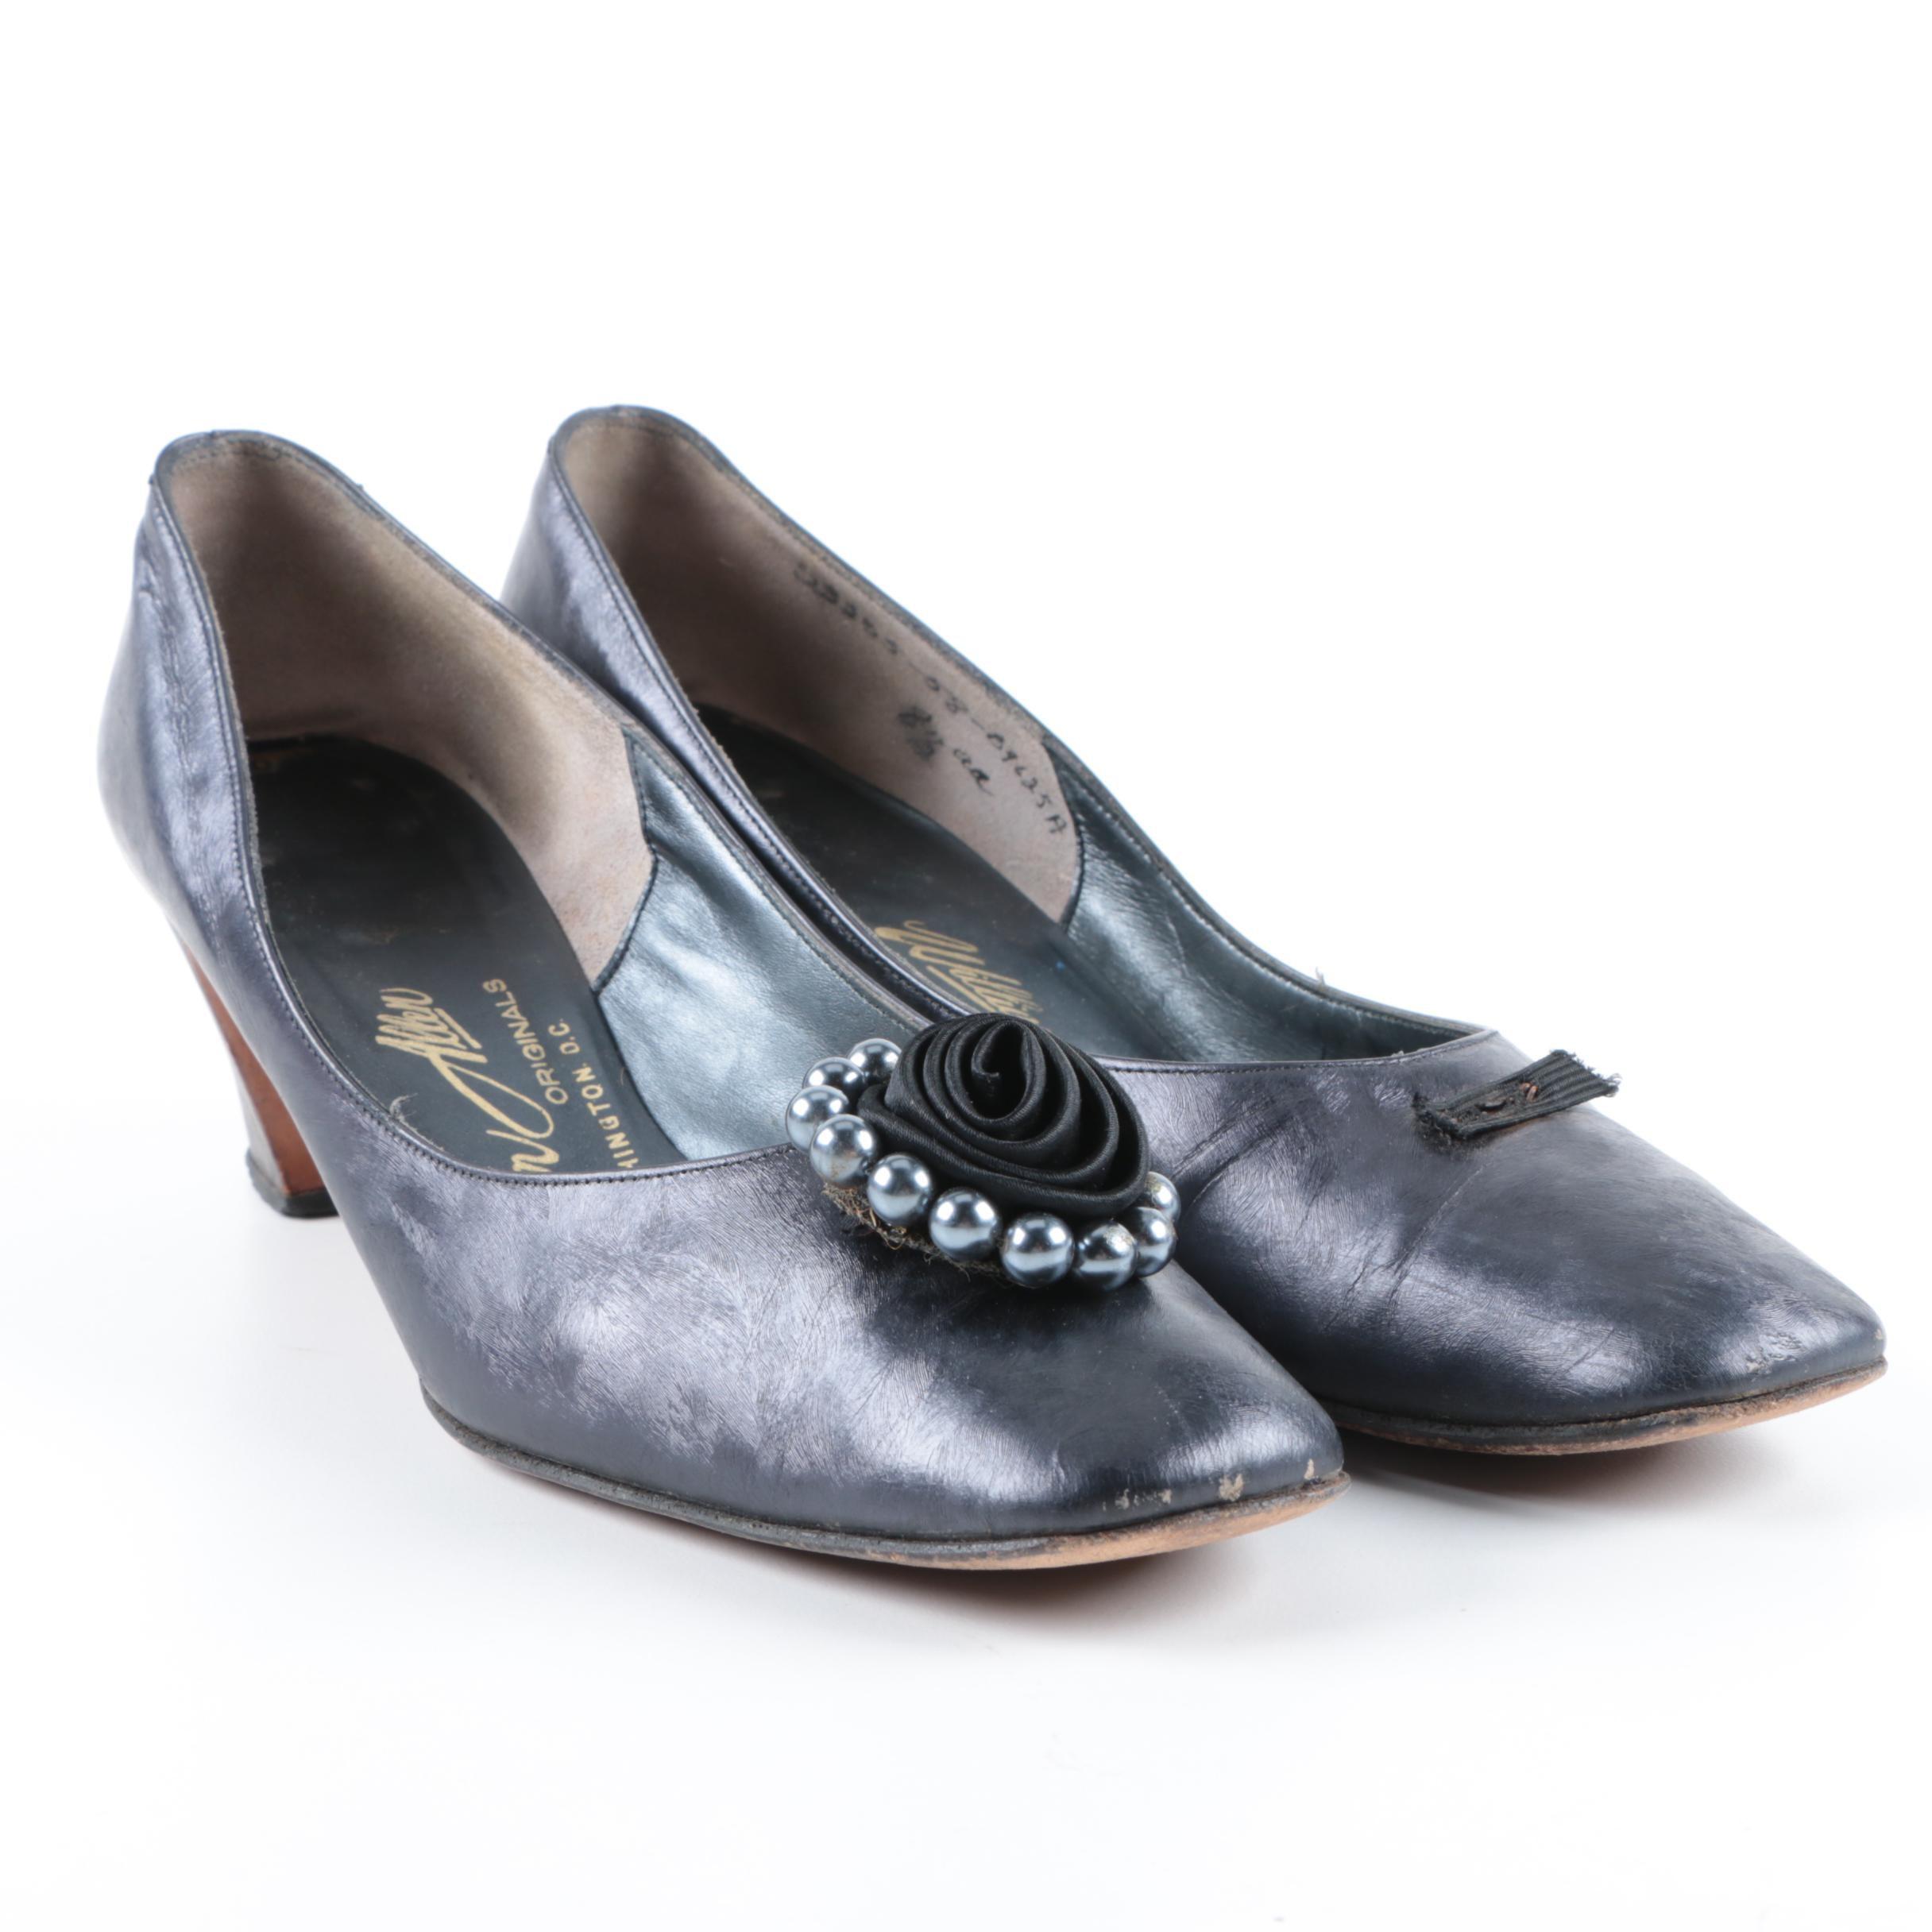 Vintage William Allen Stacked Heeled Shoes